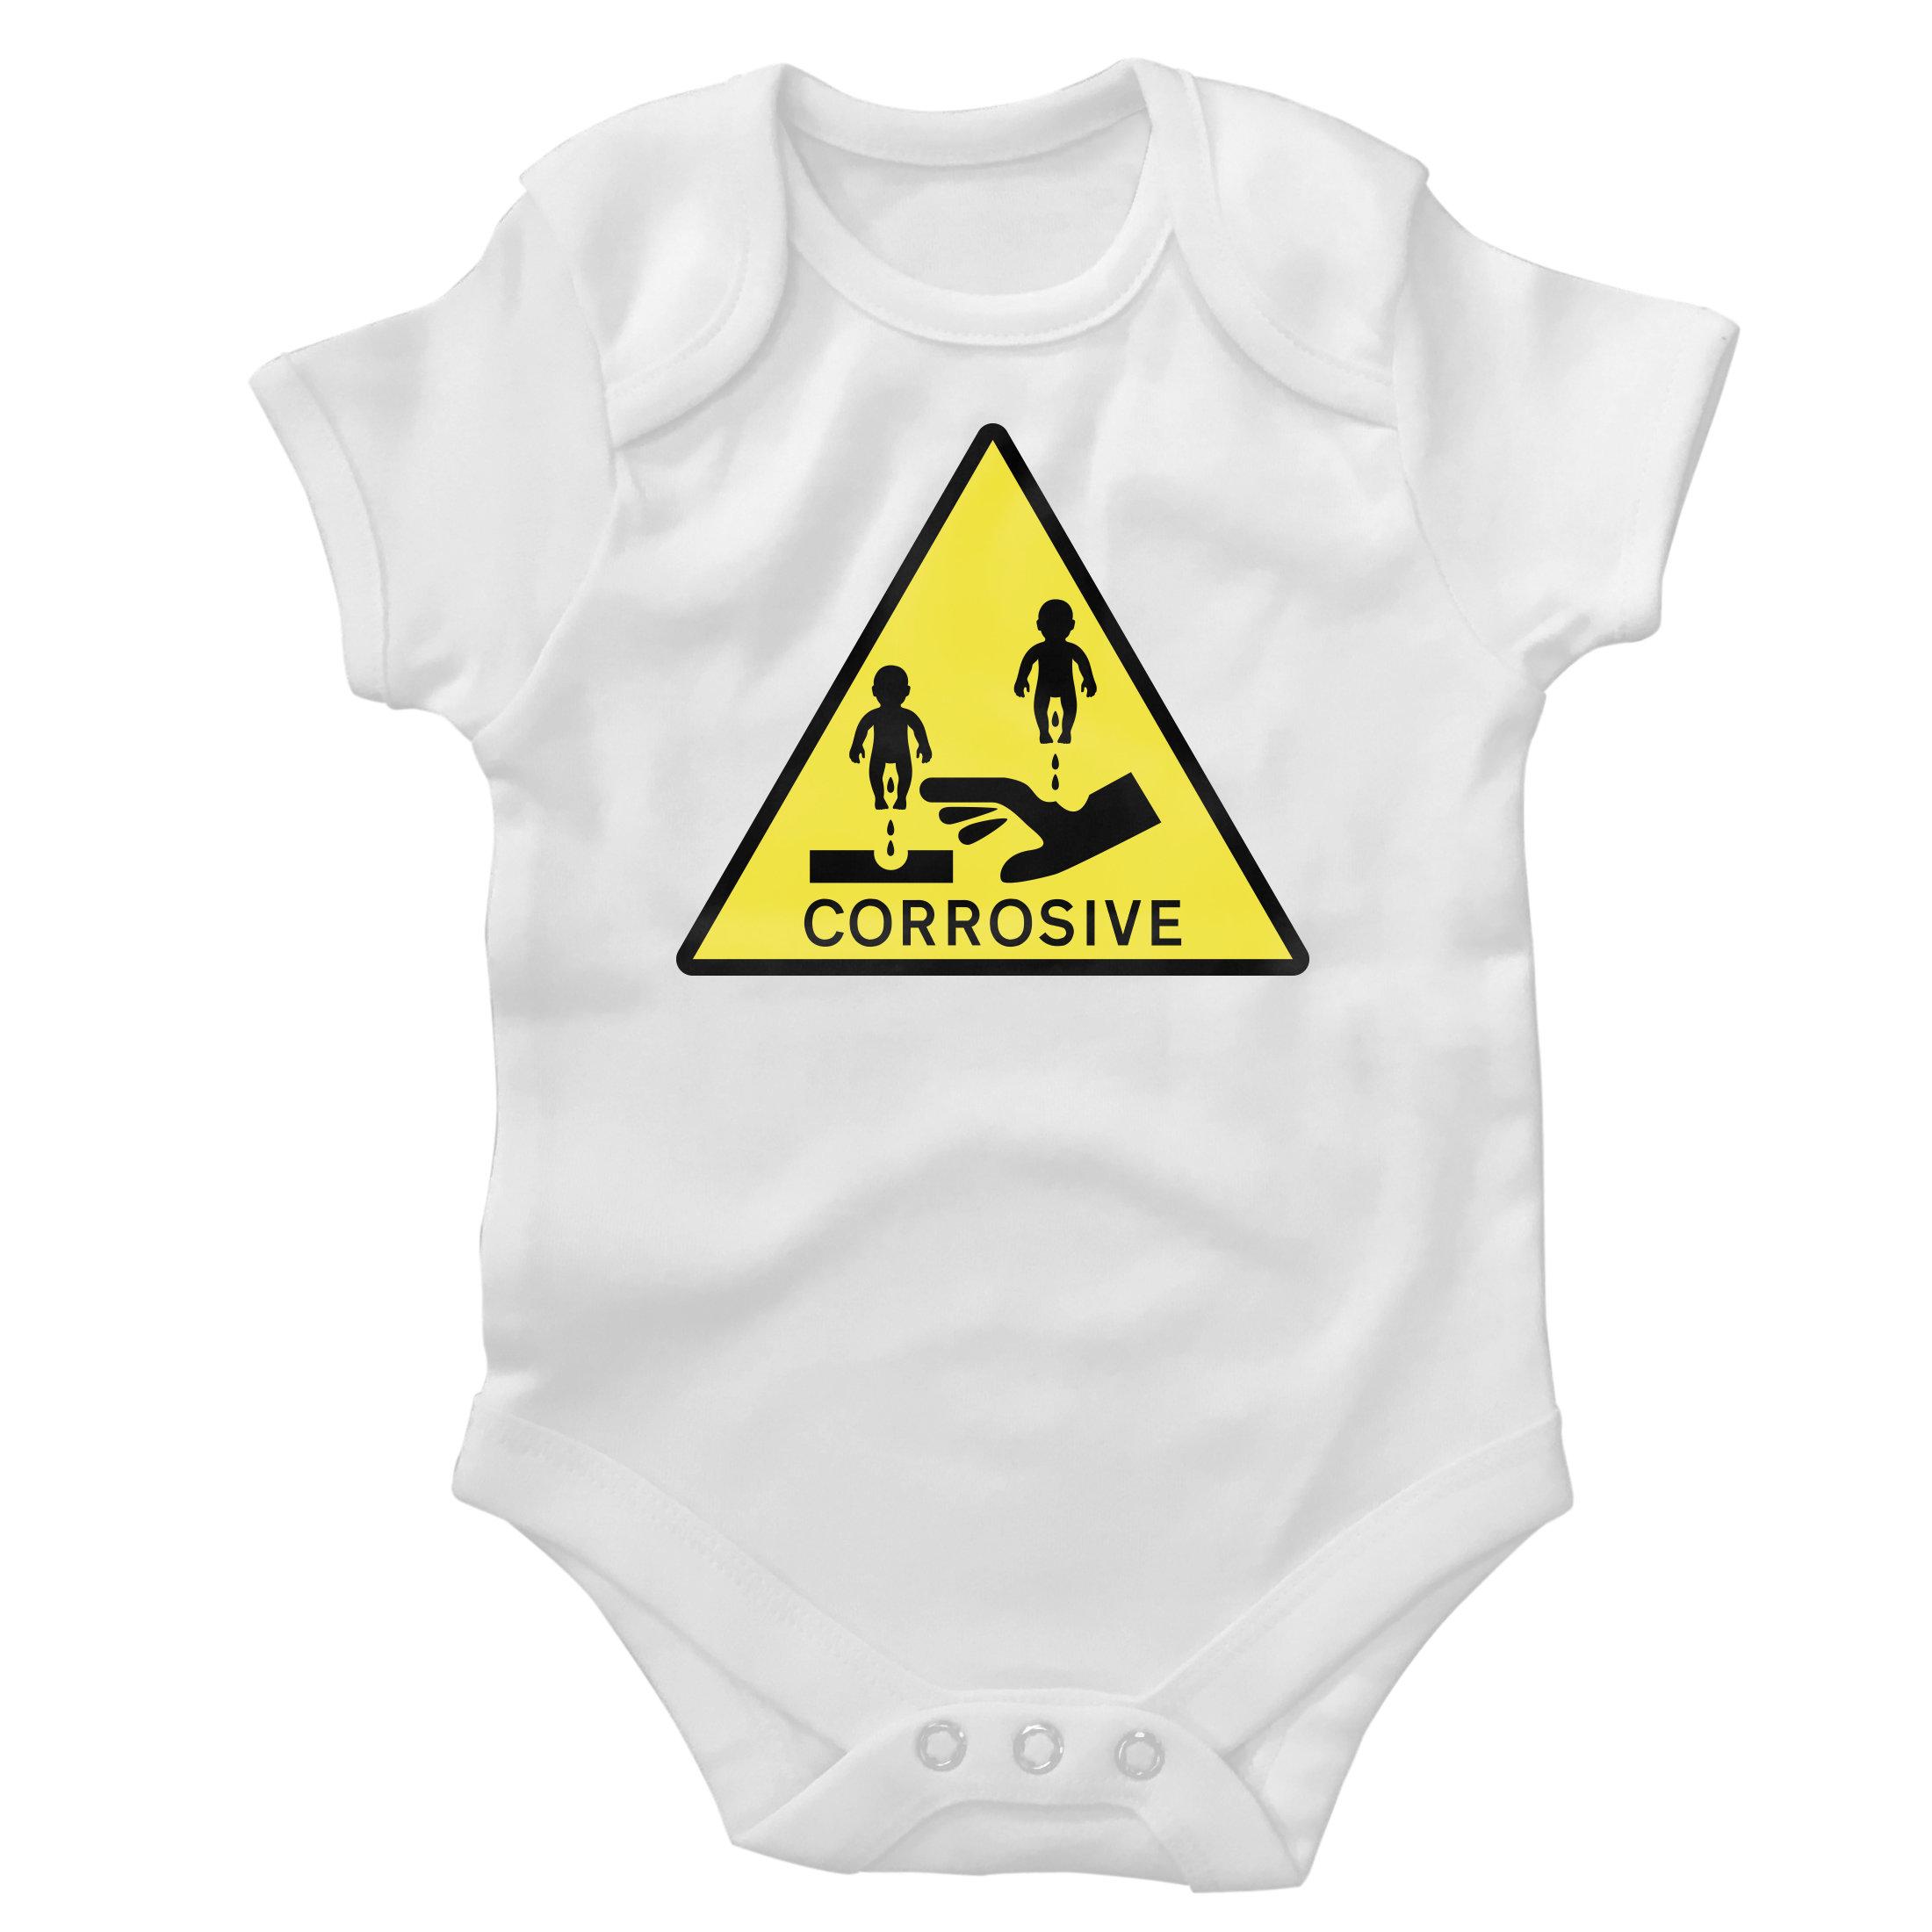 'Corrosive' Baby Grow CorrosiveBG